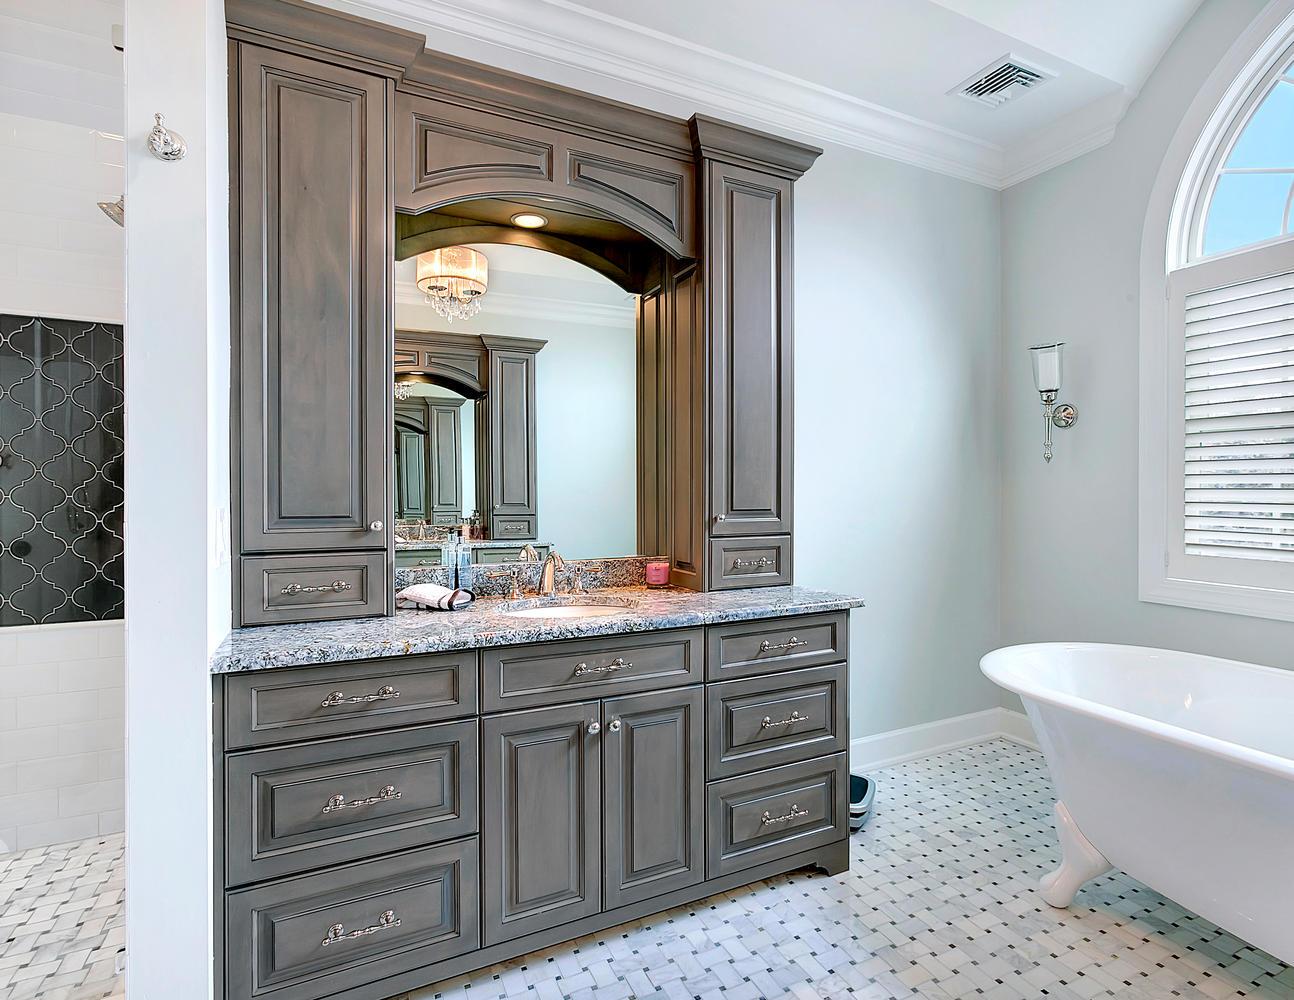 100+ [ Home Design Nj ] | Best 25 New Home Designs Ideas On ...